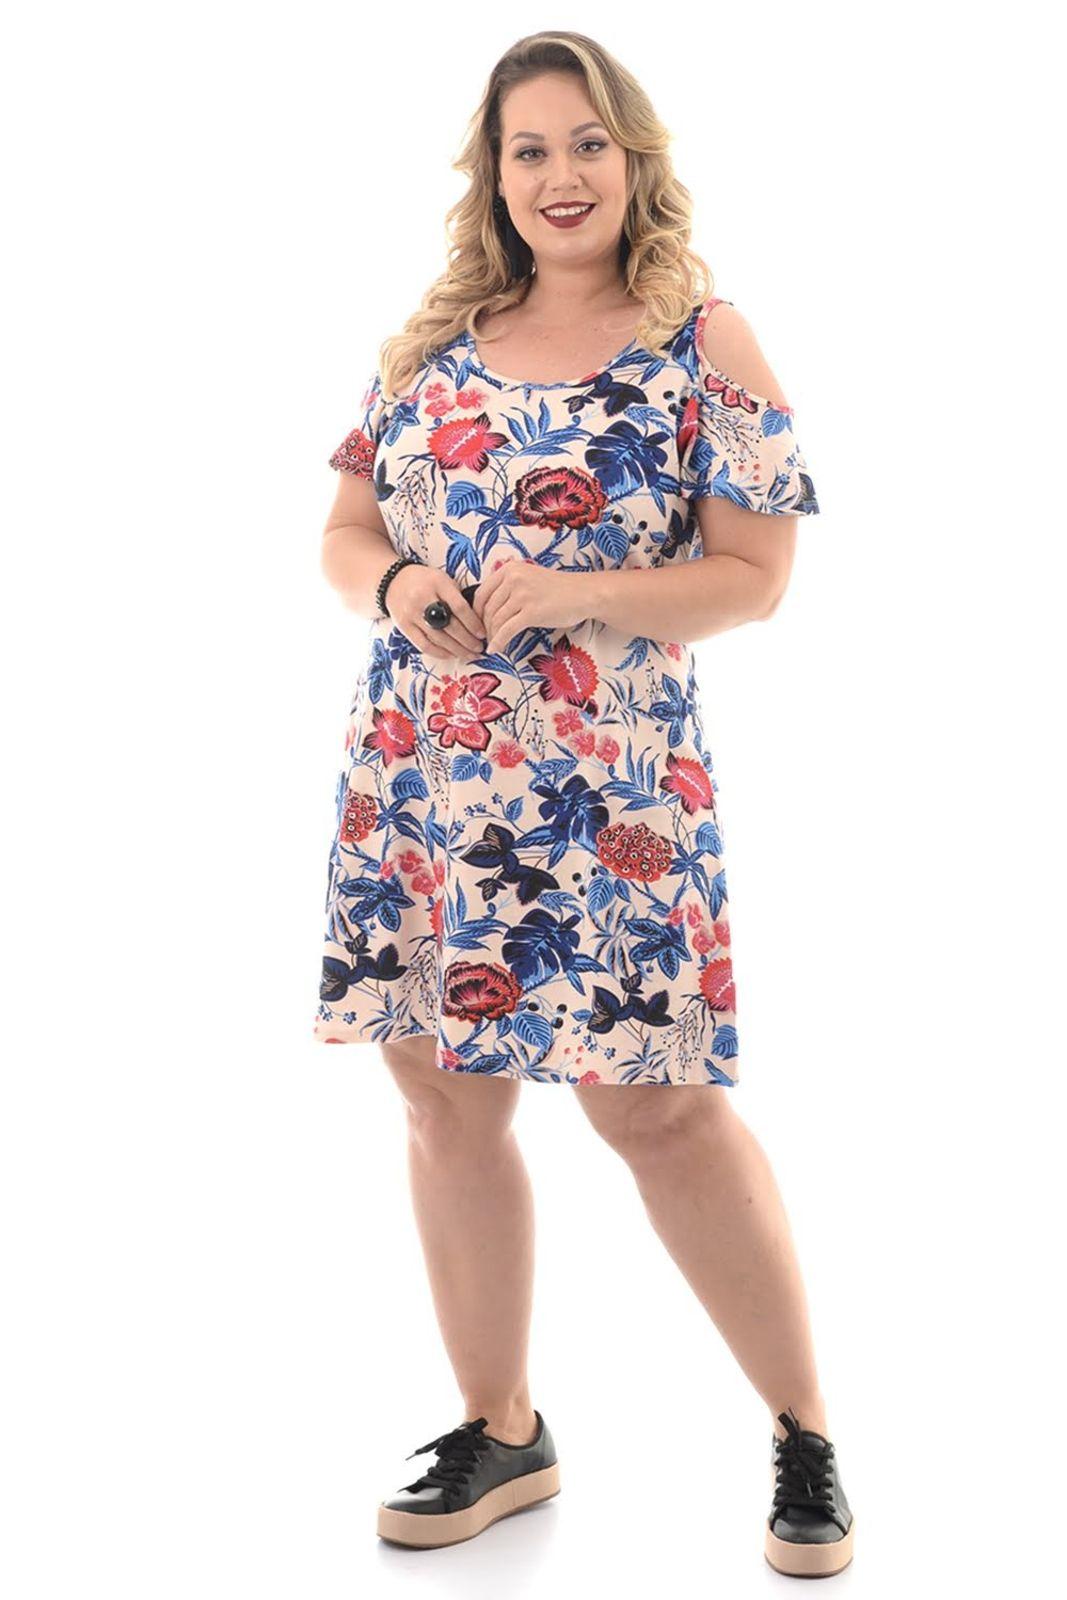 a7cfc54997f1 Vestido Domenica Solazzo Florais Plus Size em 2019   Products ...